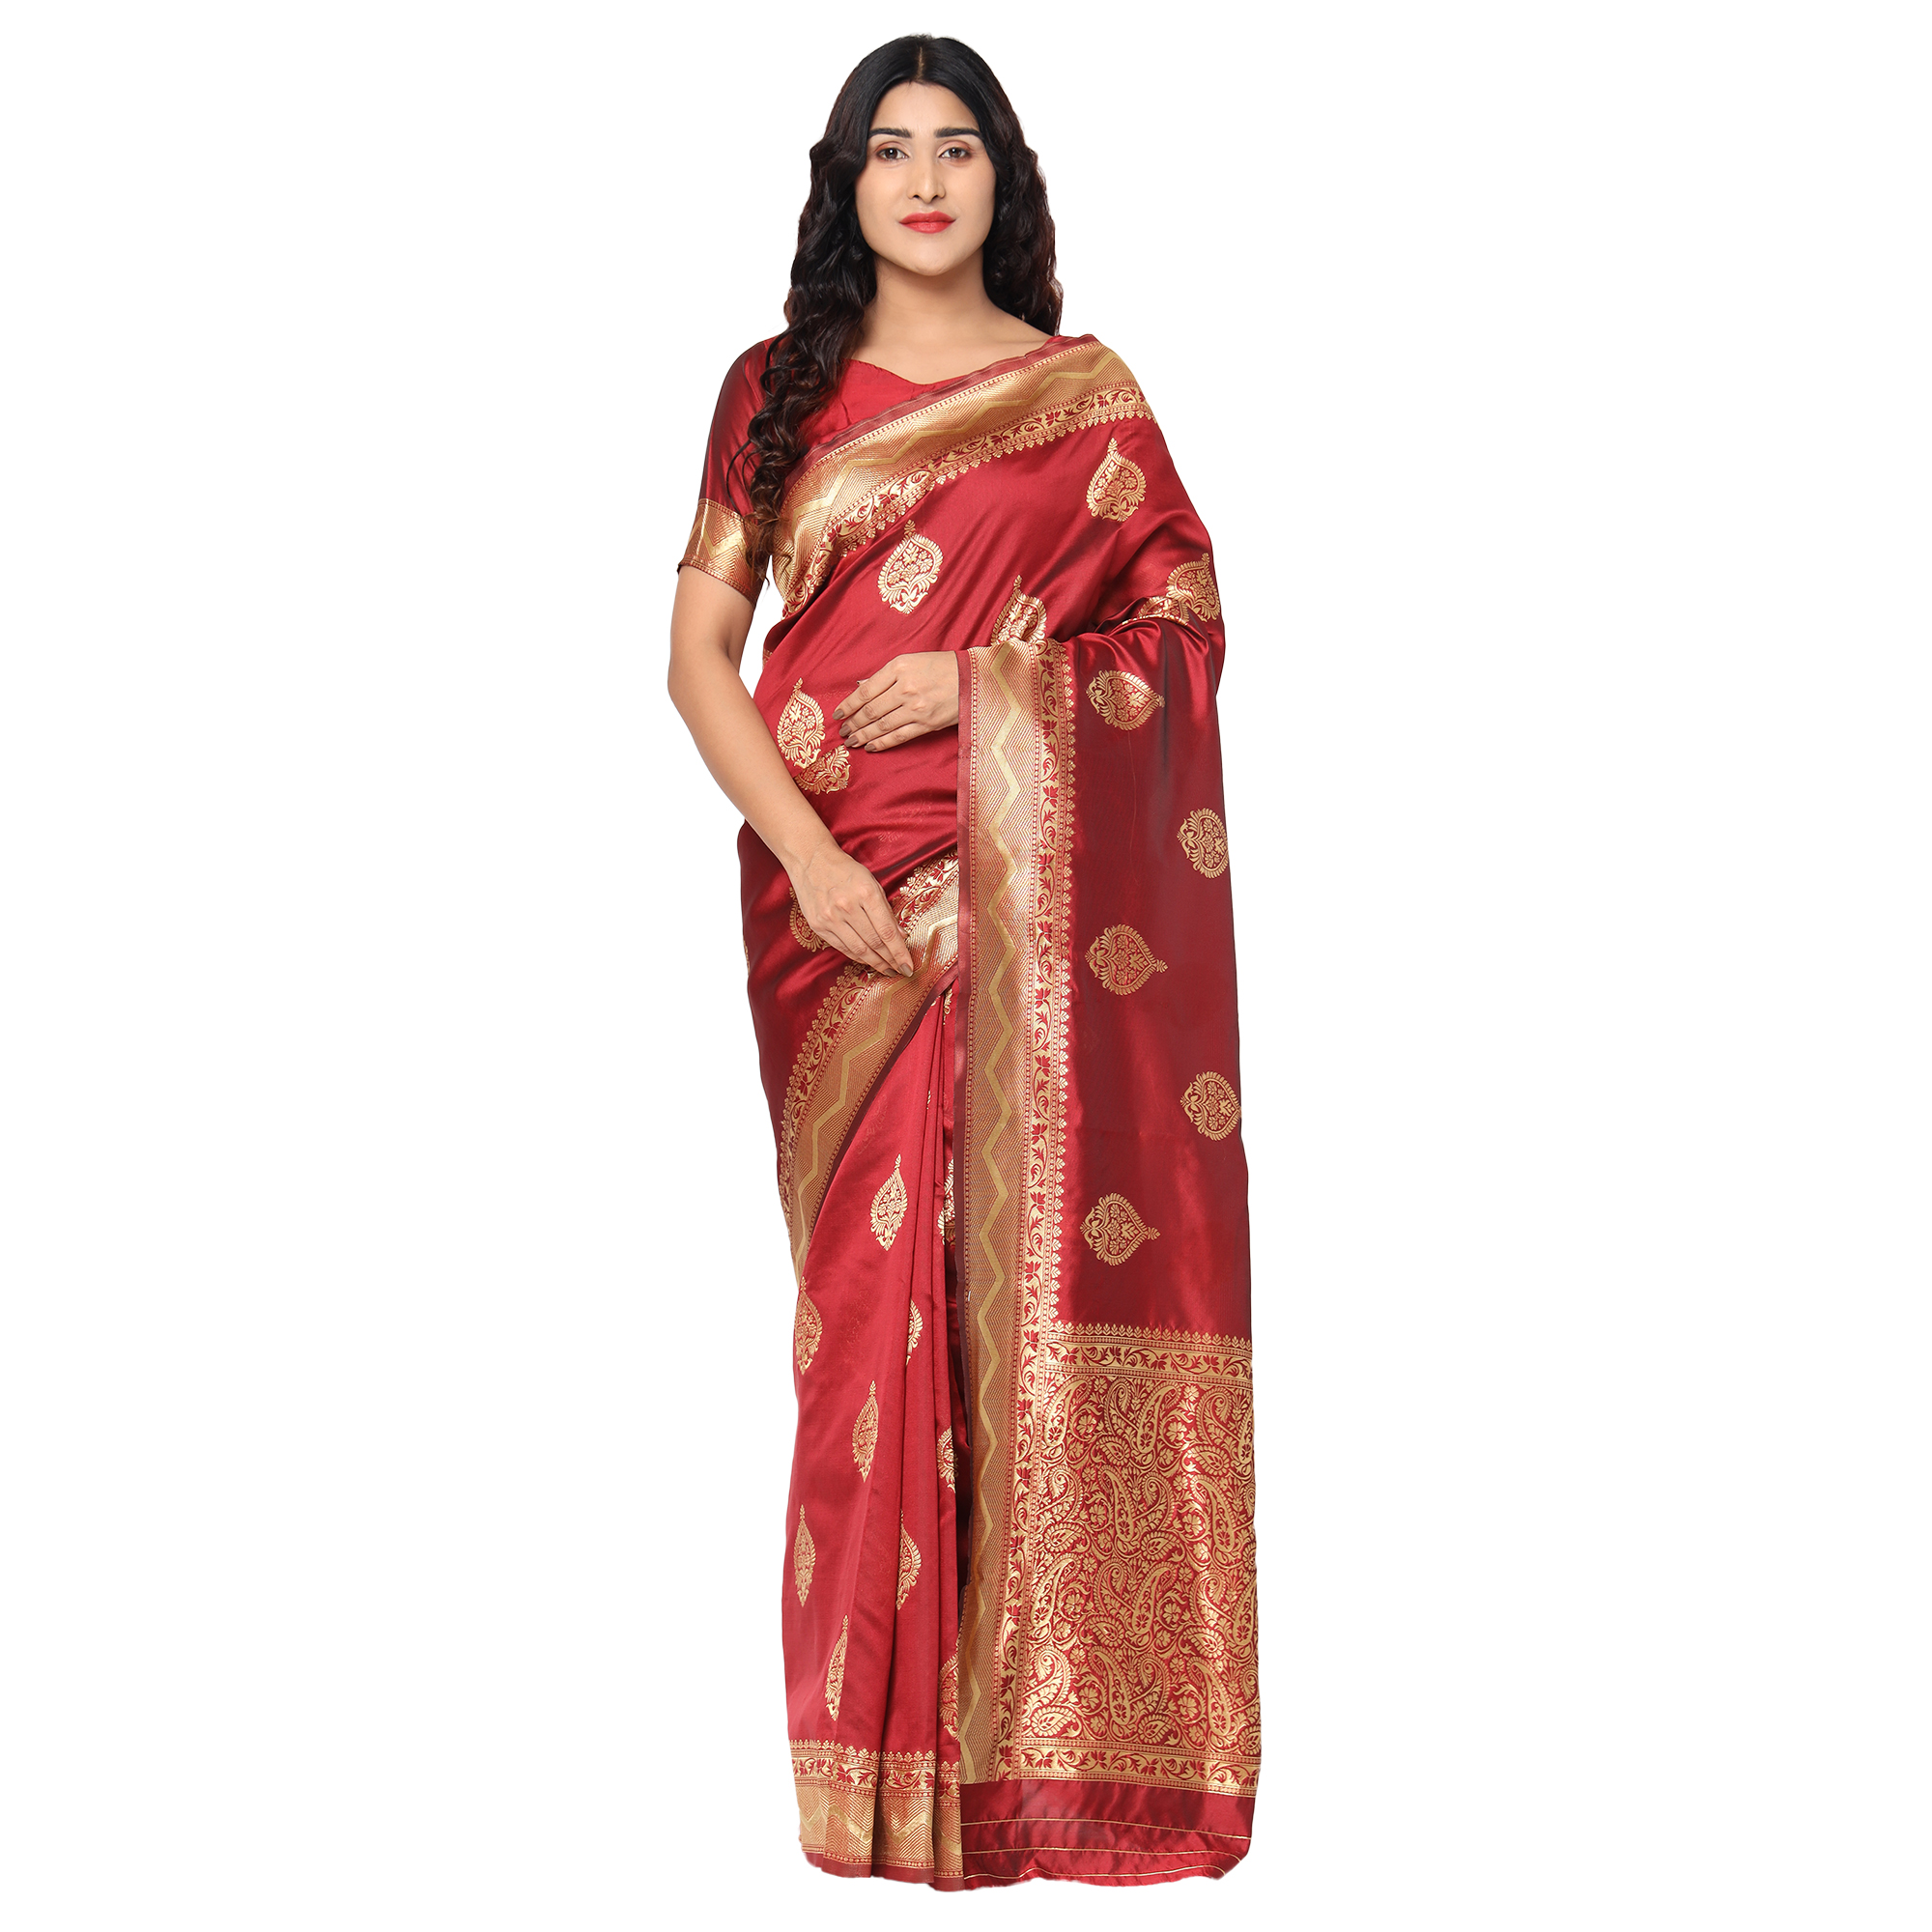 Glemora Maroon Beautiful Ethnic Wear Silk Blend Banarasi Traditional Saree